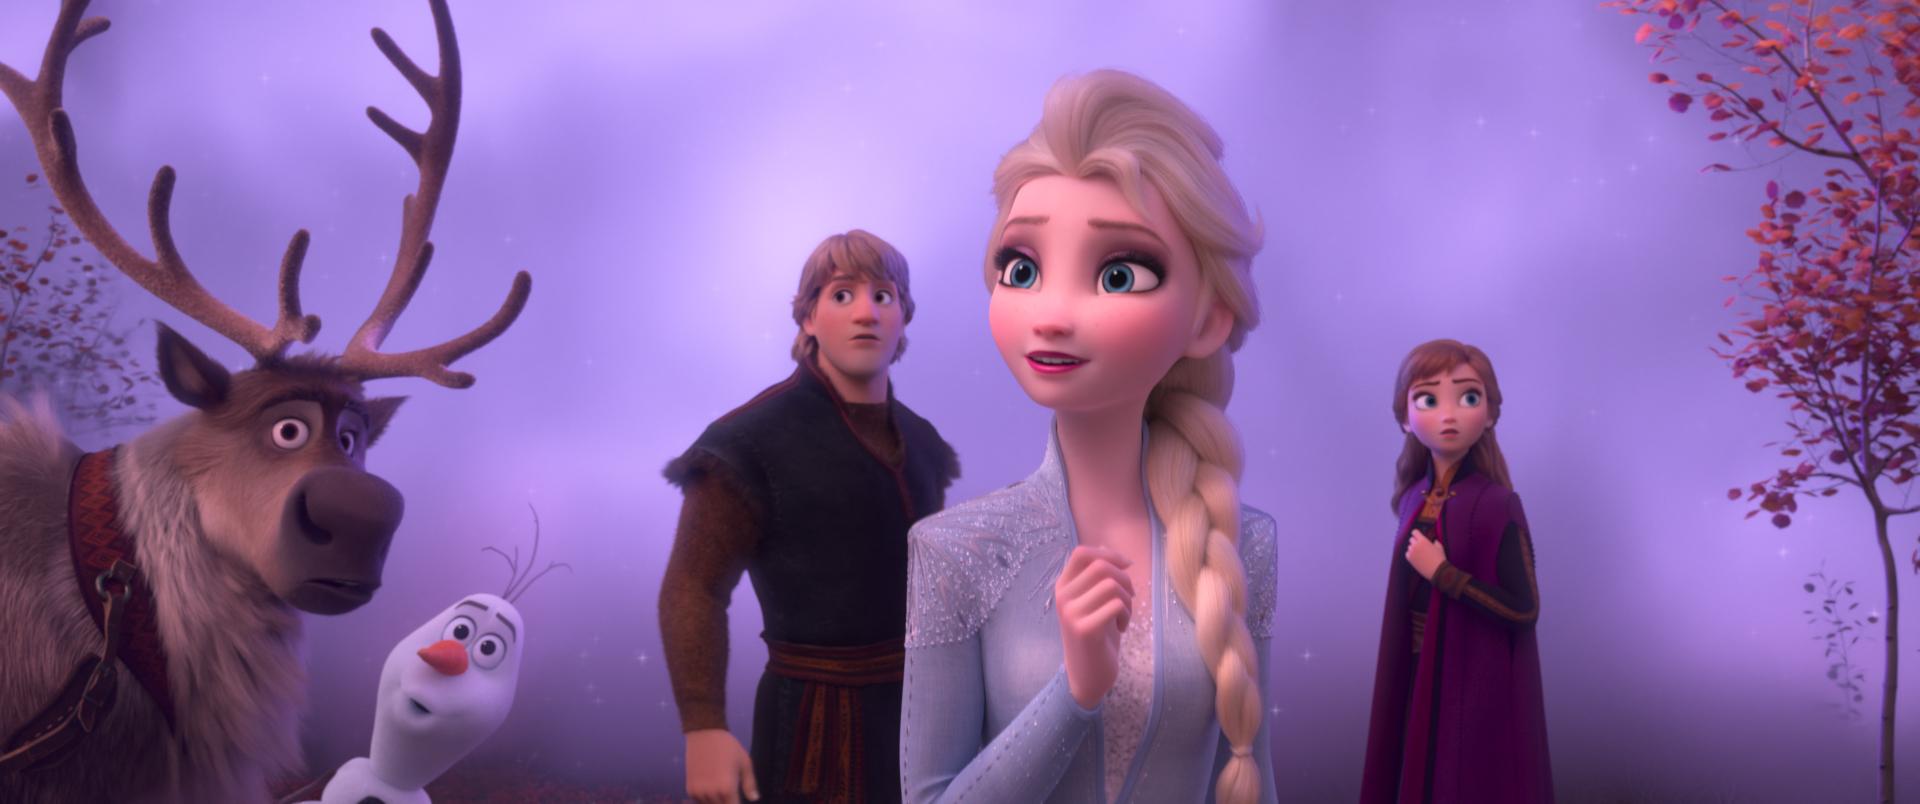 Frozen 2 main characters, Frozen 2 safe for kids